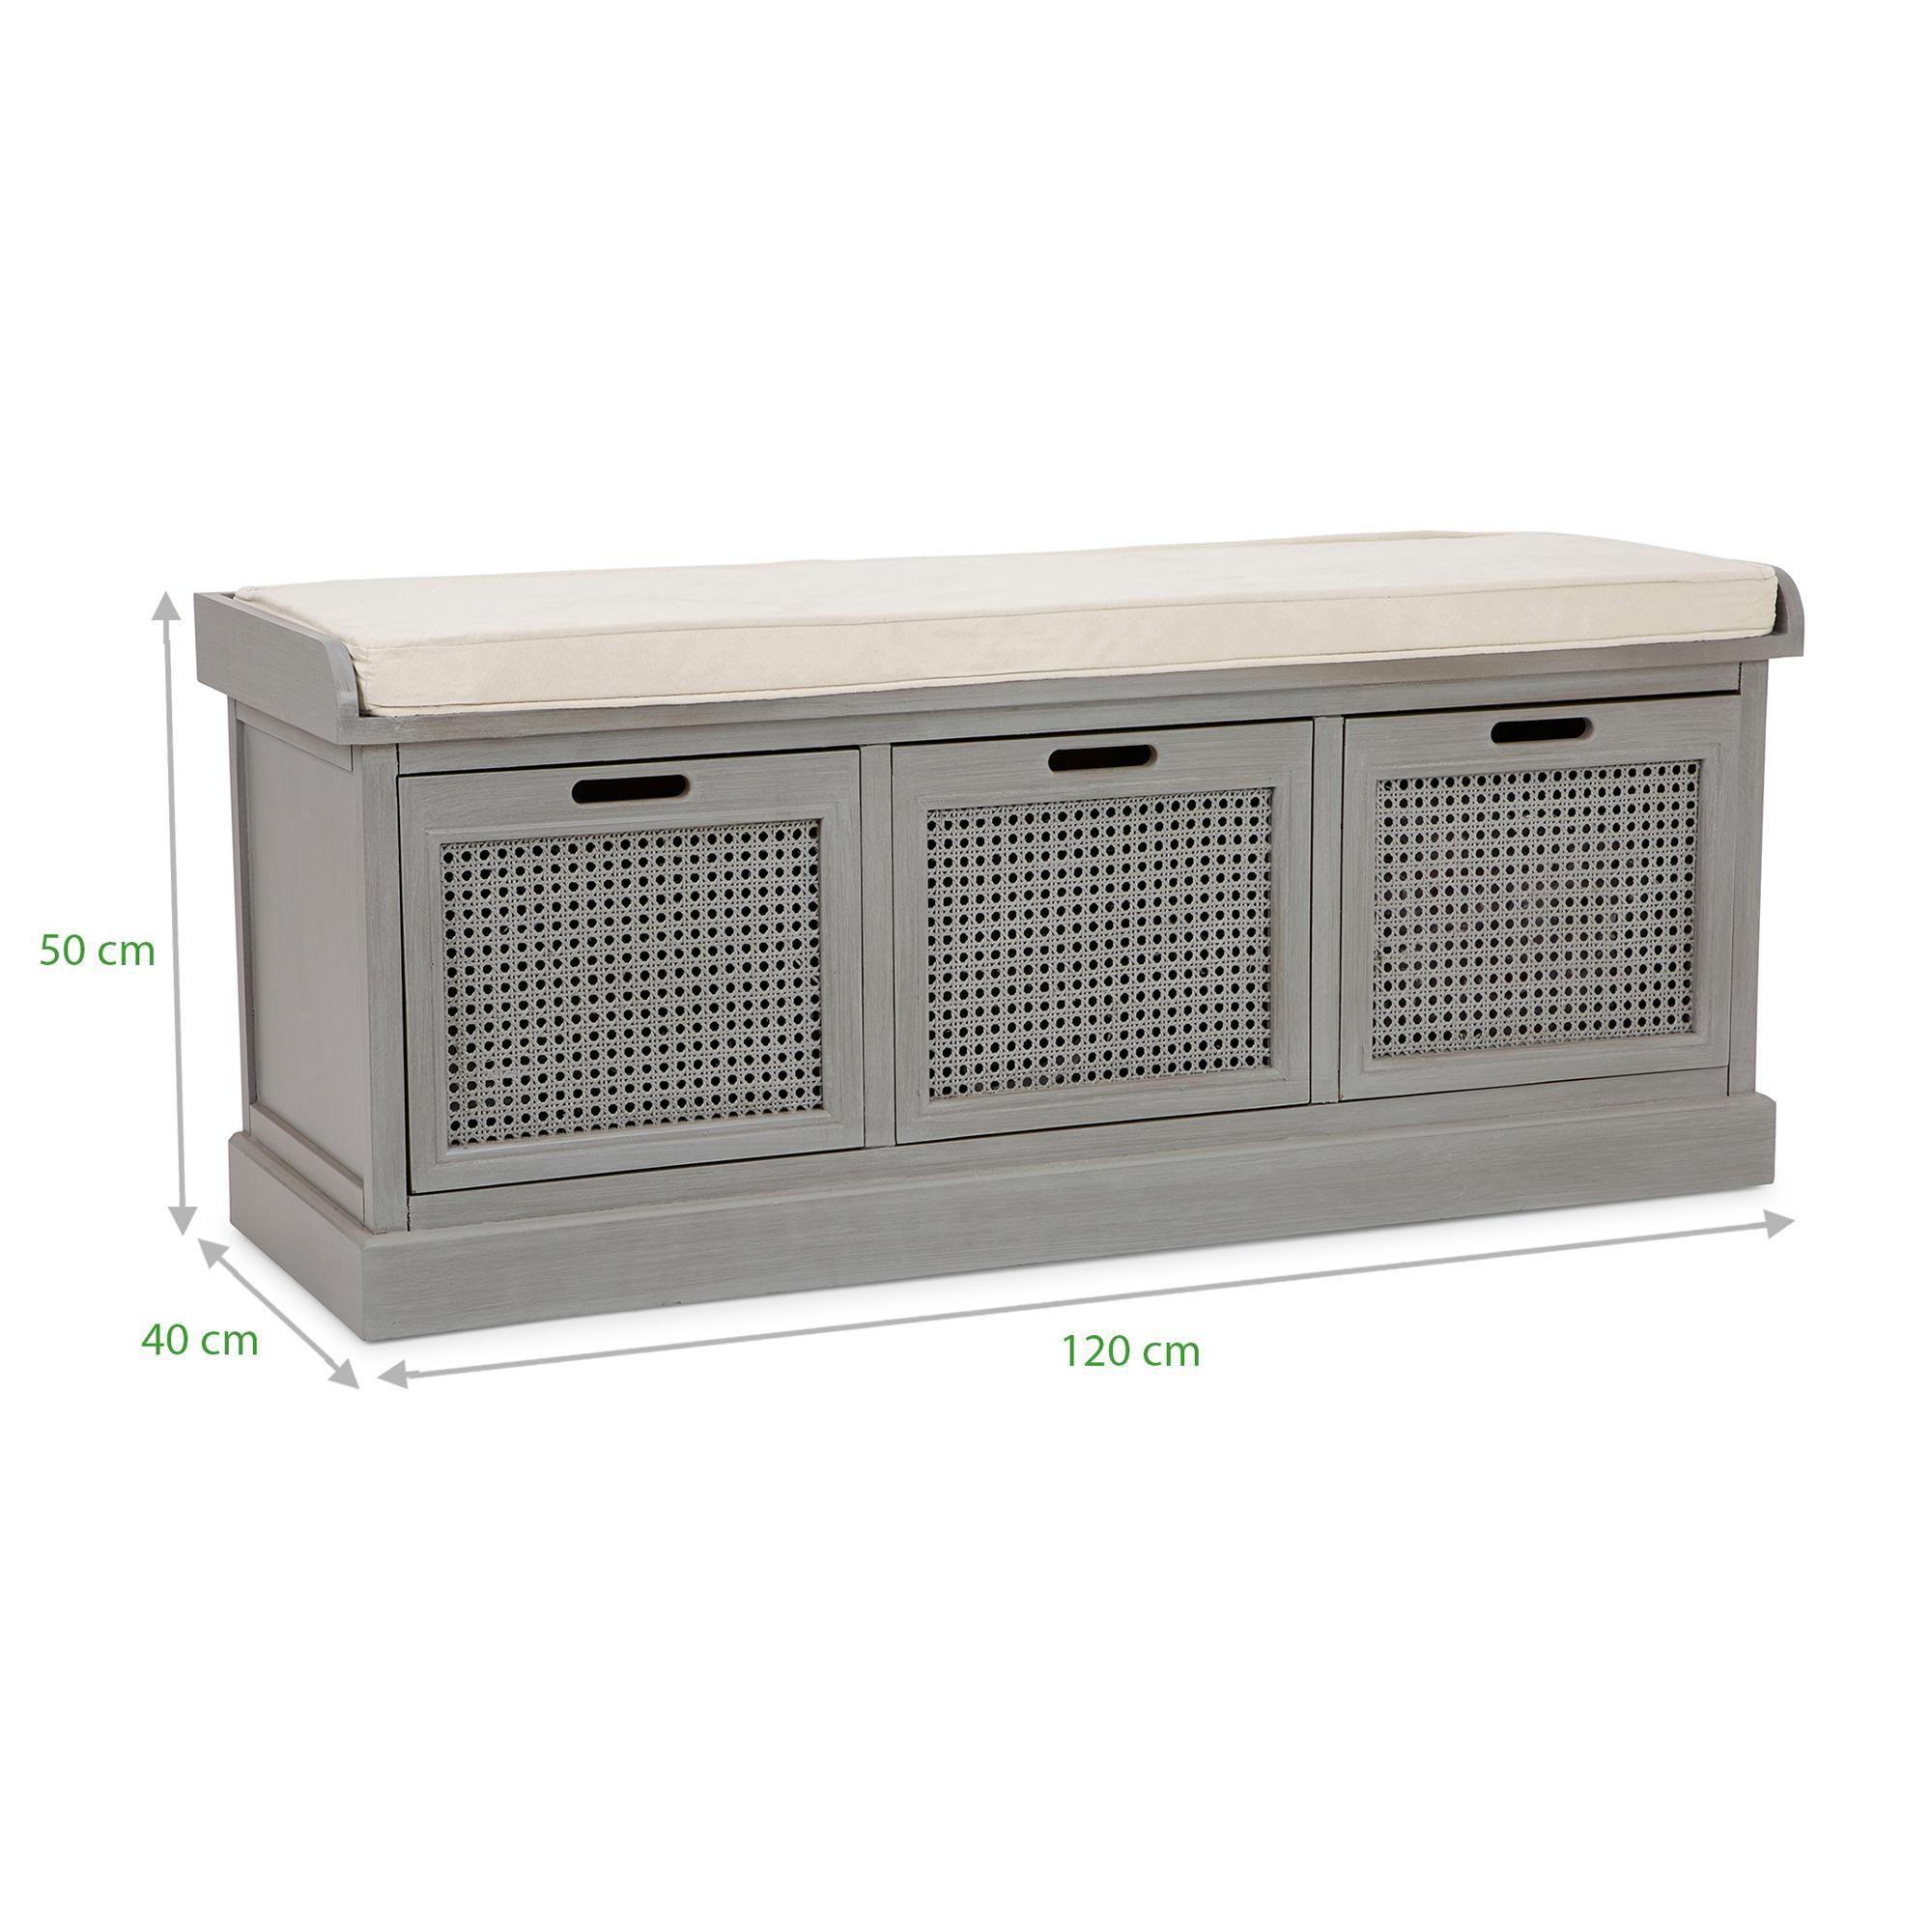 Lucy Cane Grey Storage Bench In 2020 Grey Storage Bench Living